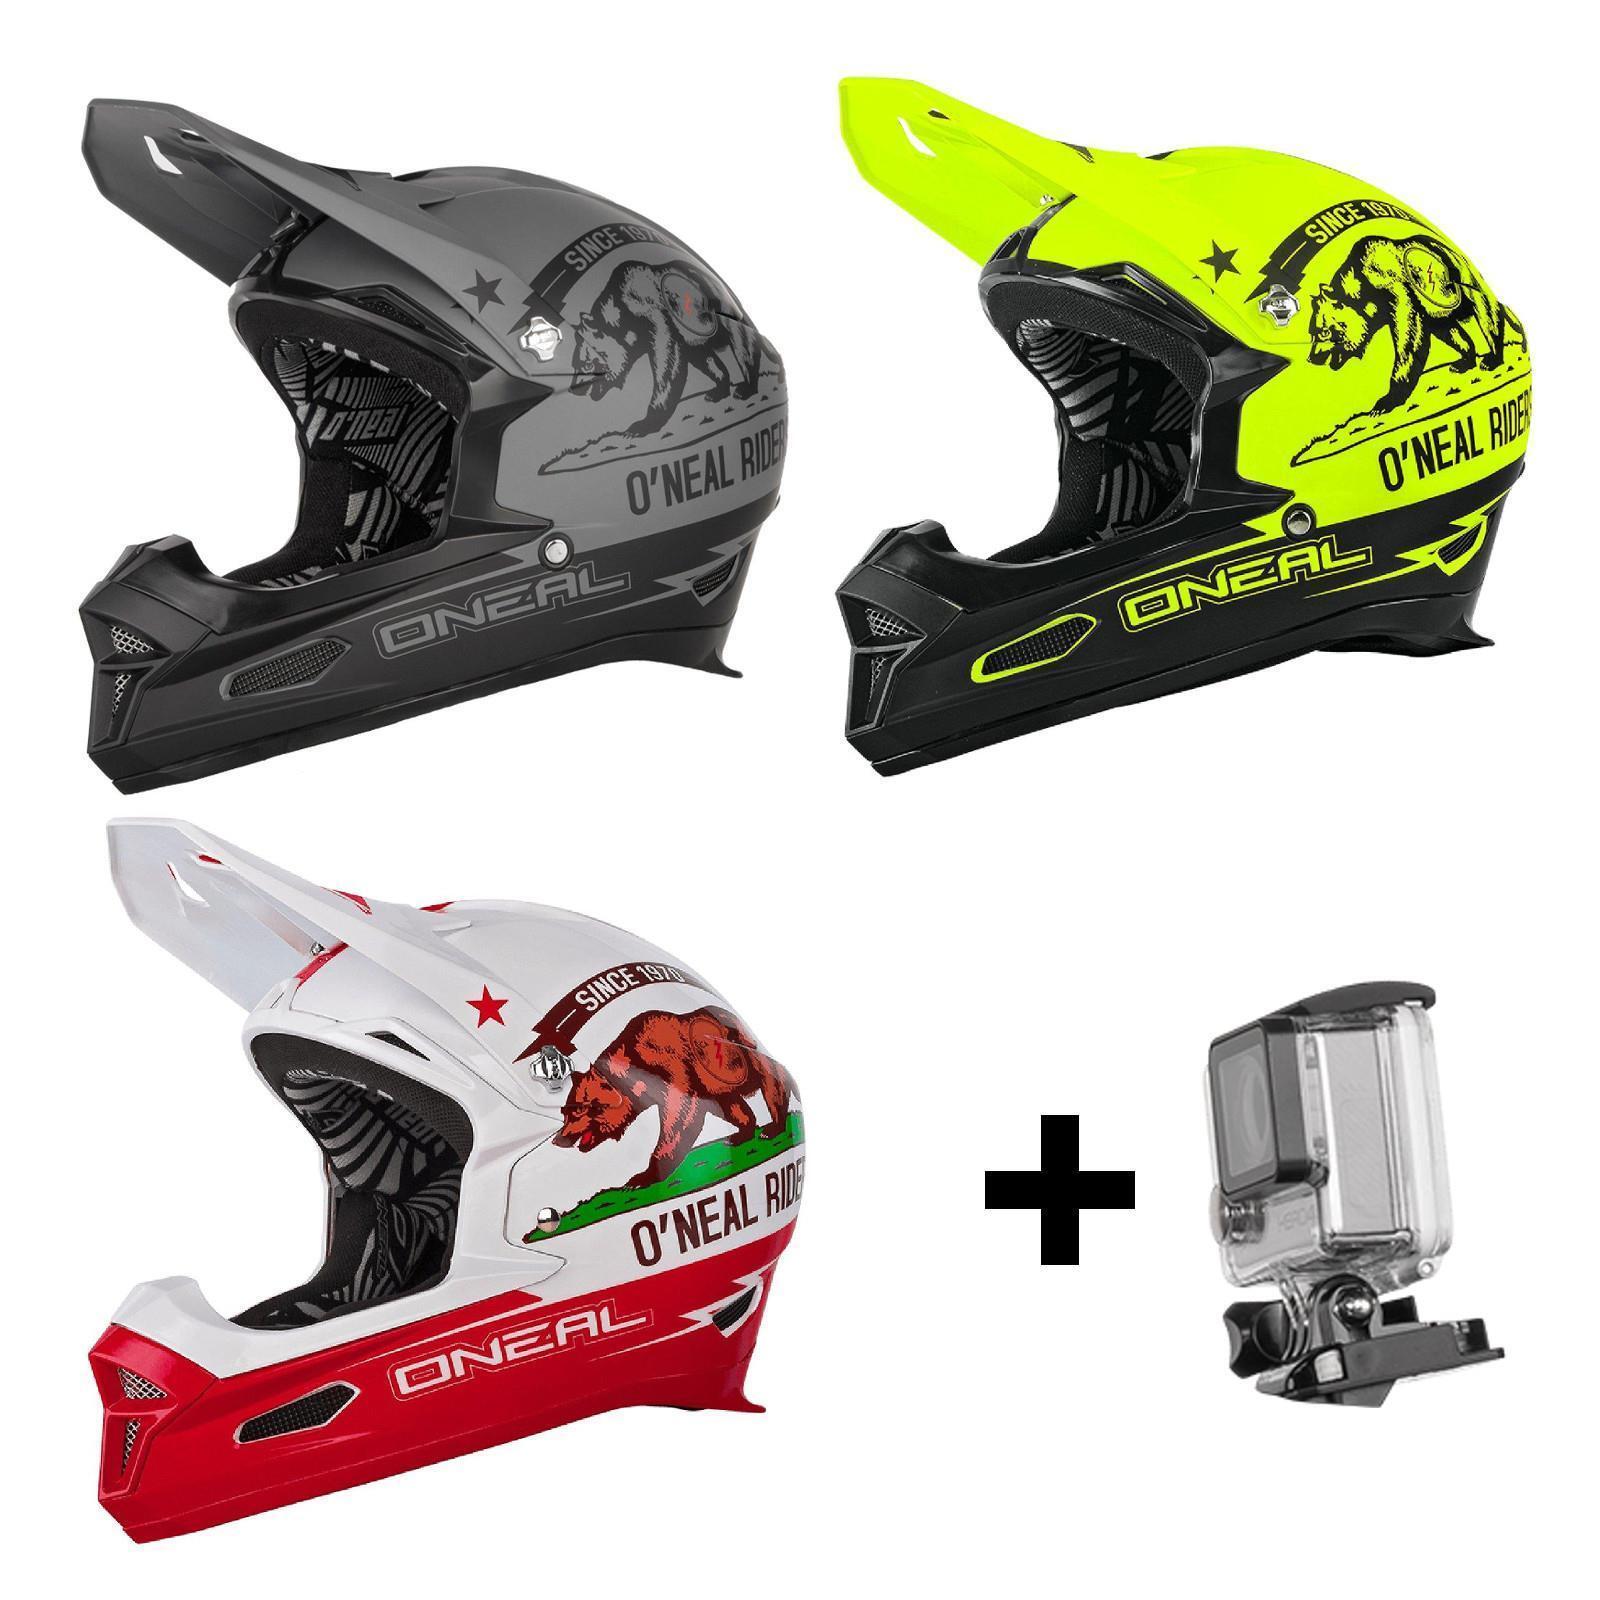 Oneal Fury RL casco California FullFace downhill DH MTB action cam mountainbike